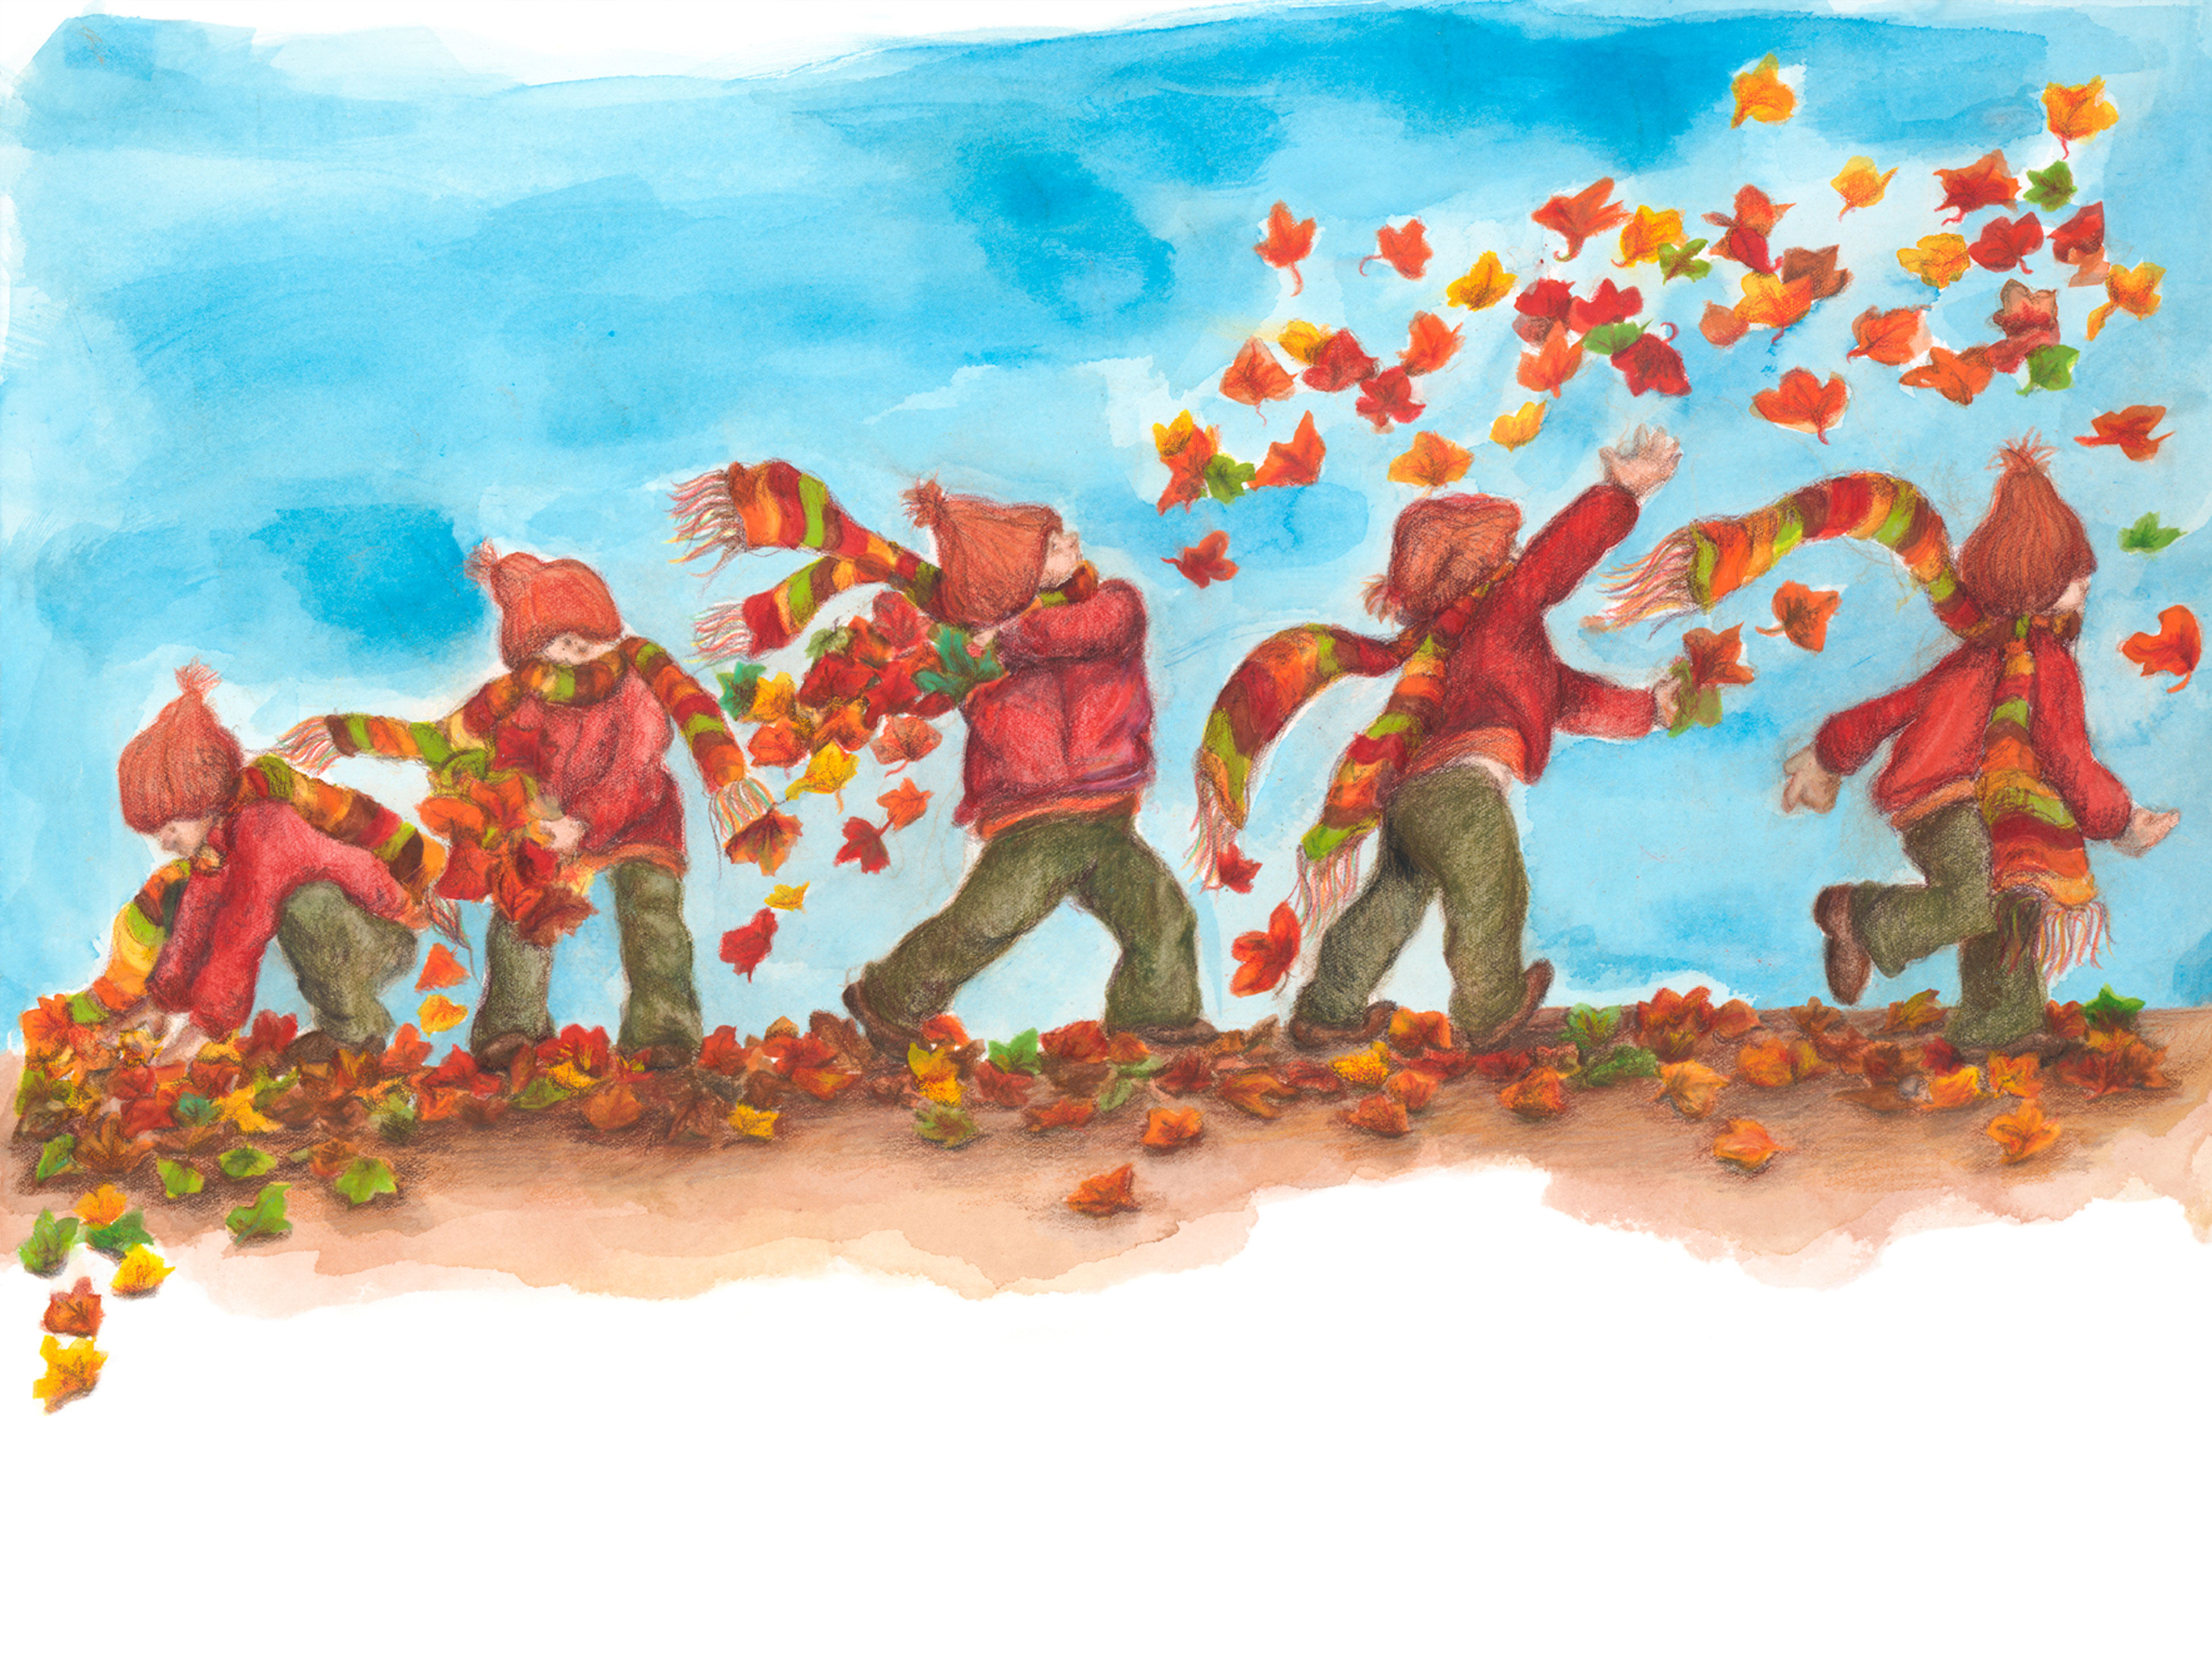 Evolution-of-an-Autumn-Leaf-Fight-September-2019